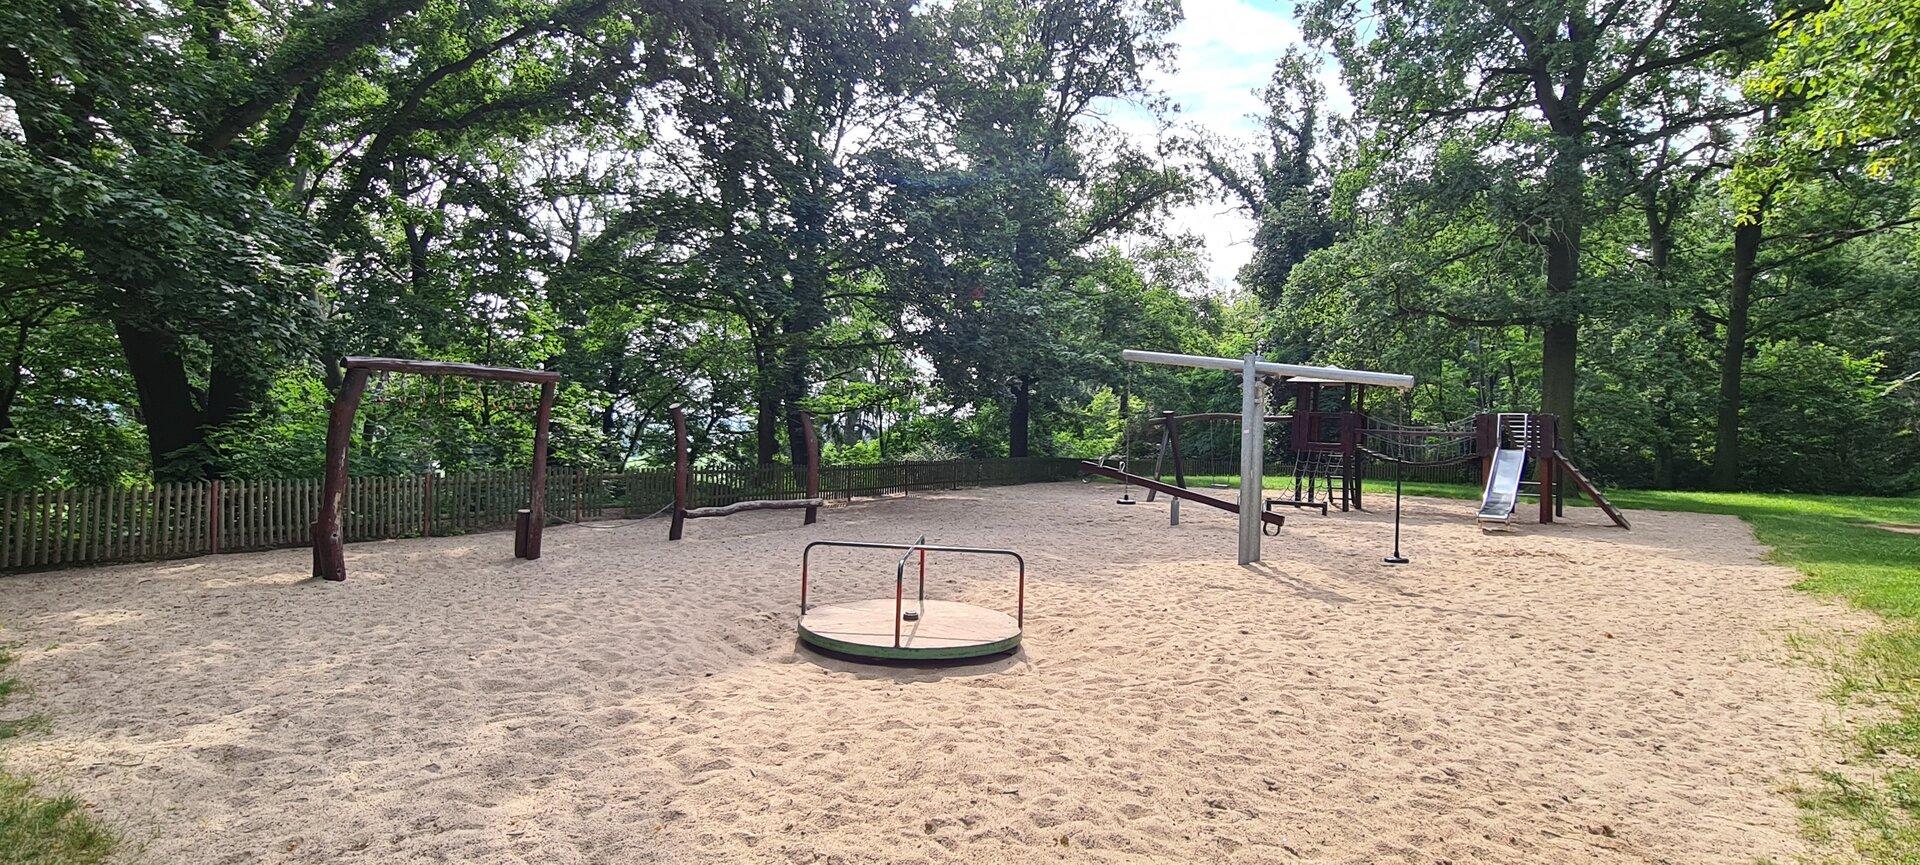 Spielplatz Stadtpark